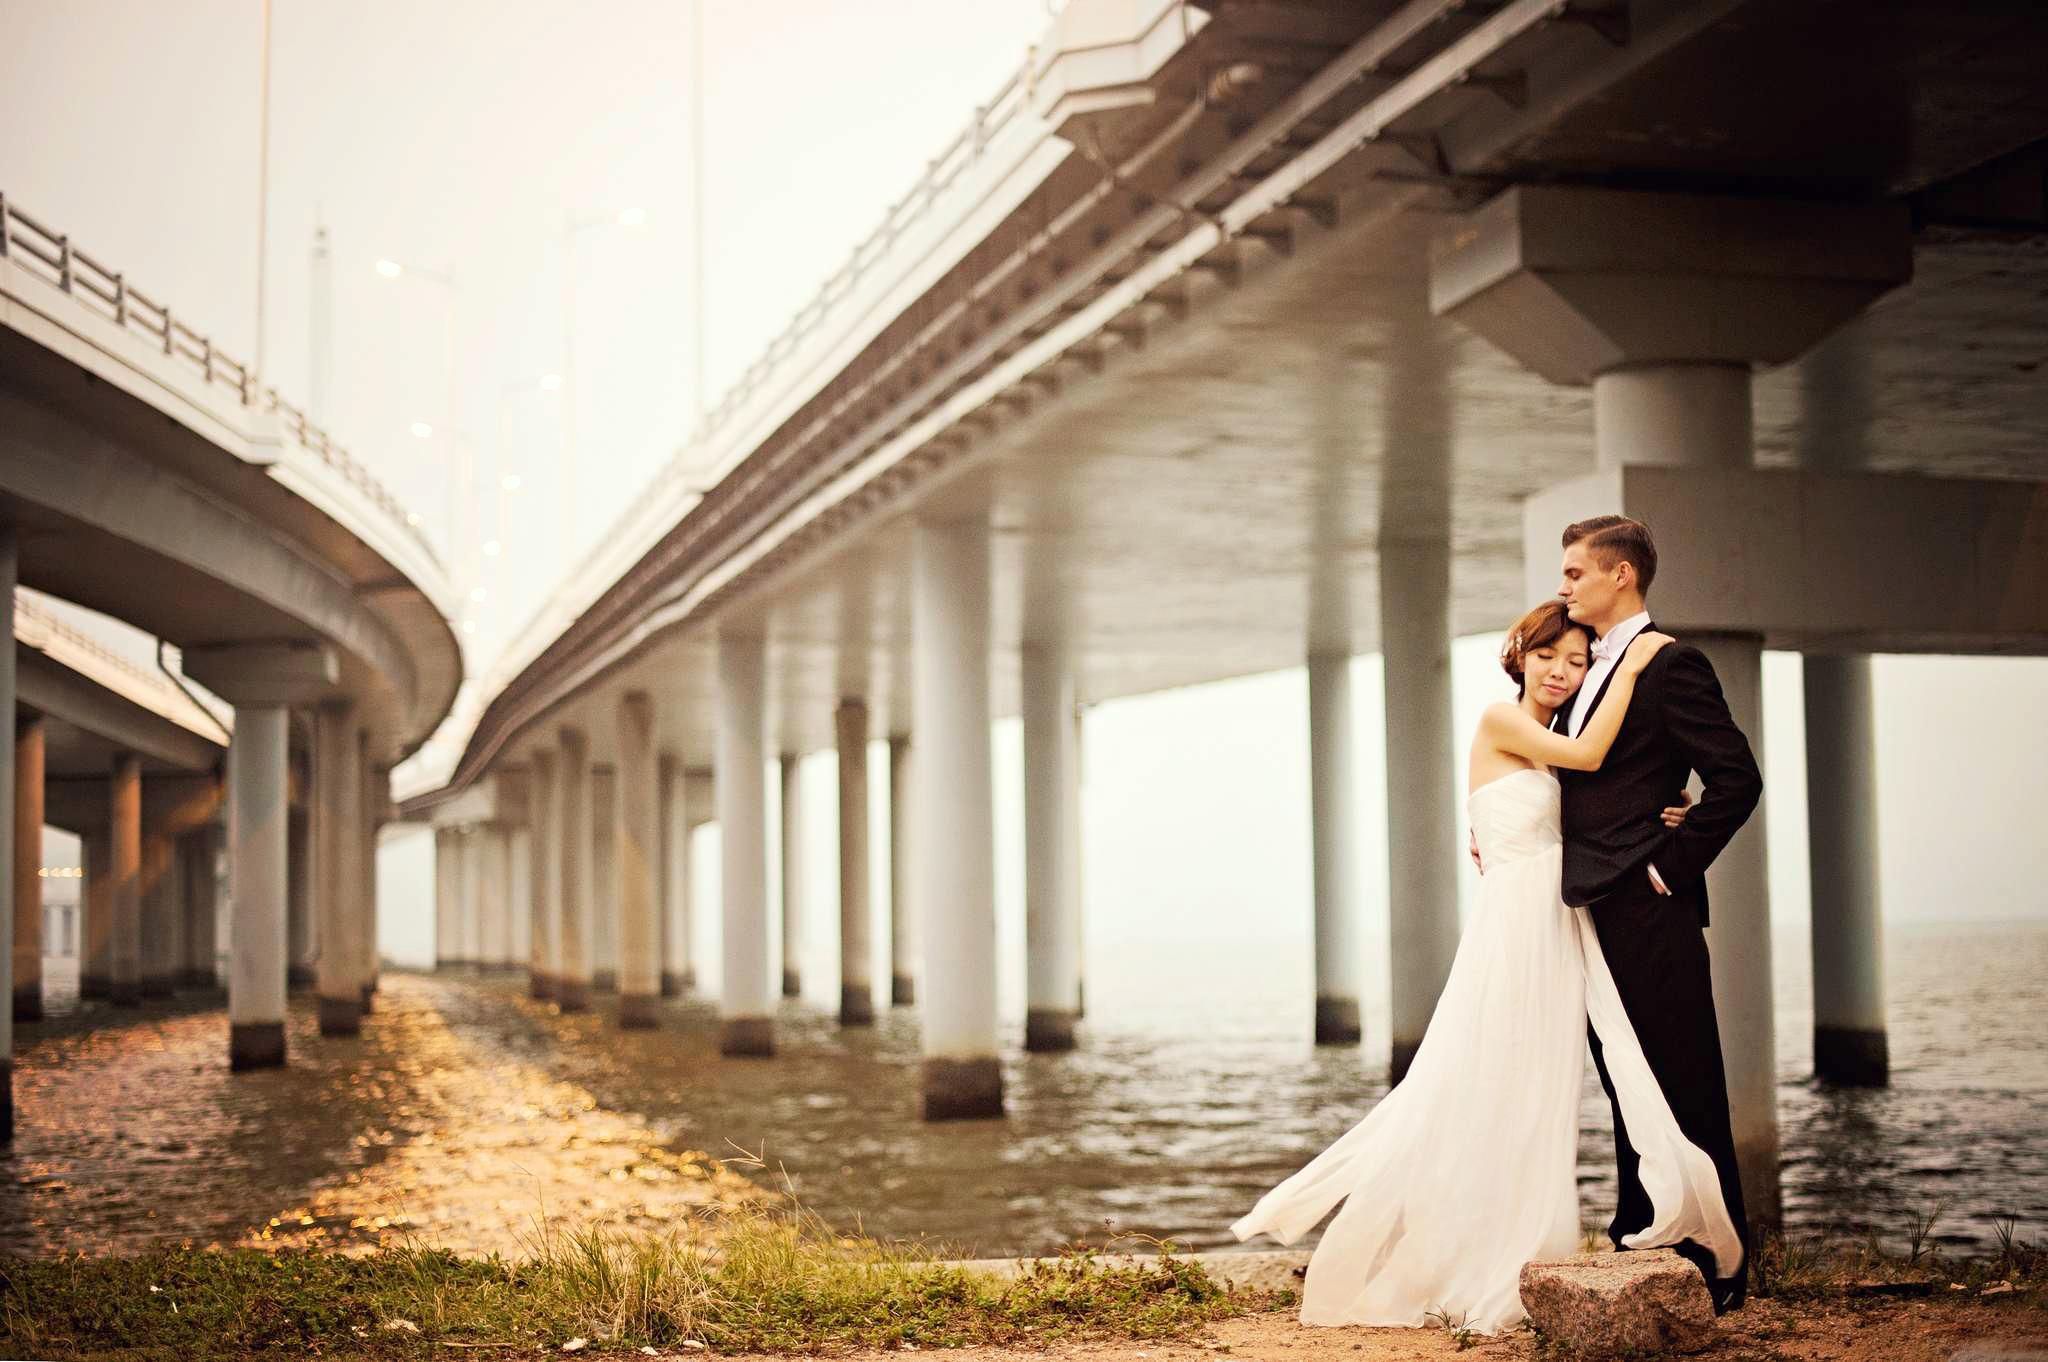 Chris_Hui_ShenZhen_Prewedding_Photography224.jpg